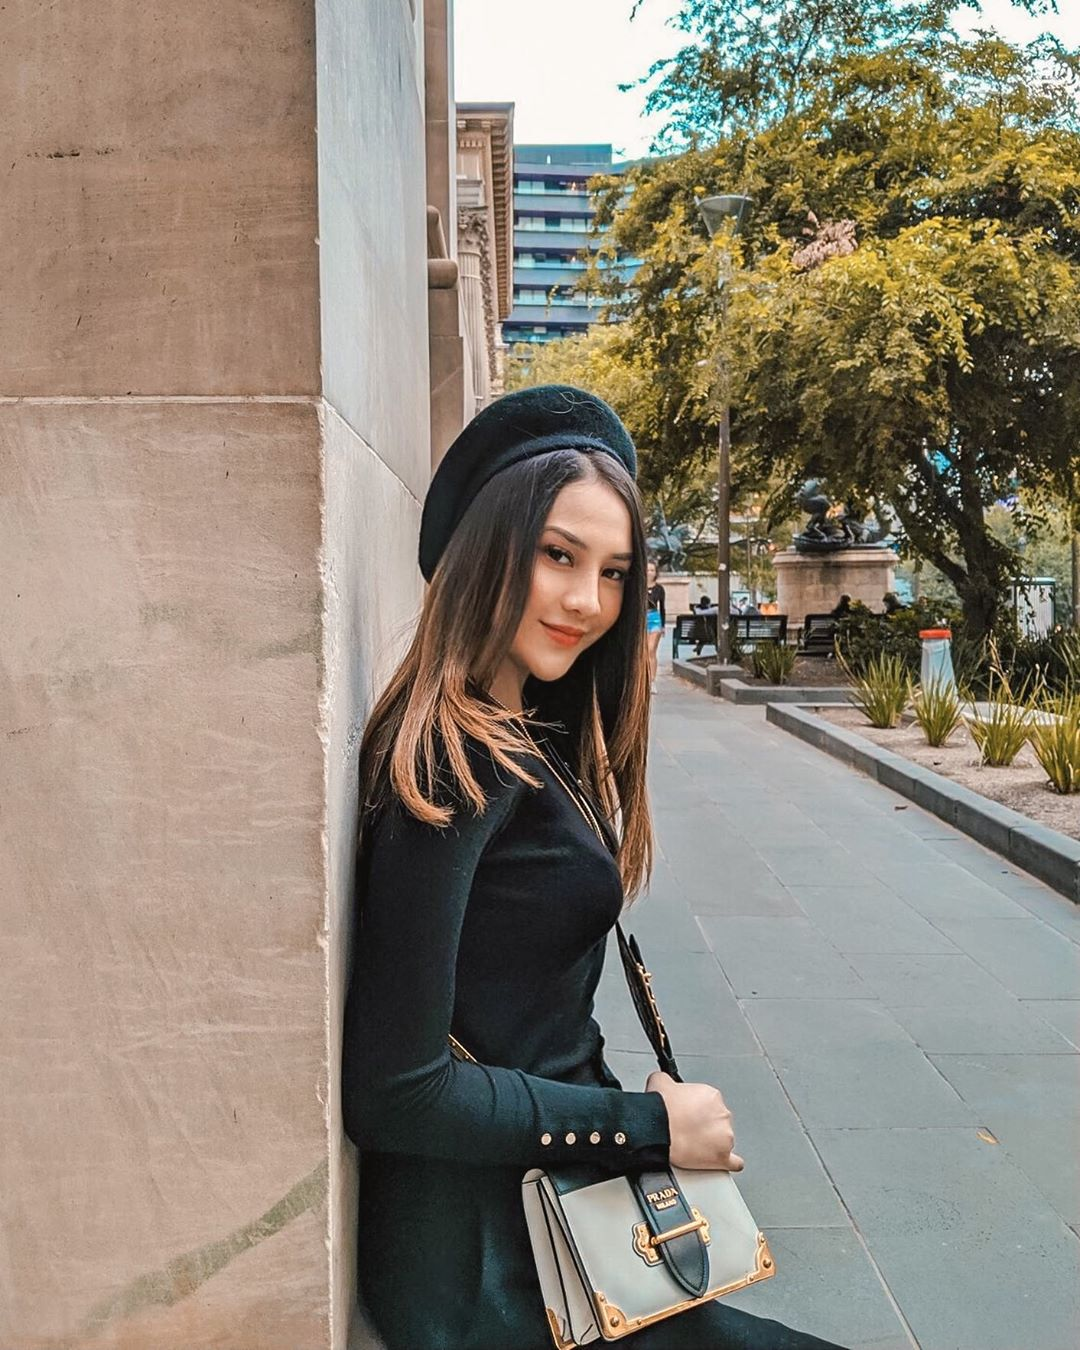 Inspirasi Pakai Topi dari 8 Selebriti Indonesia, Fashionable Banget!